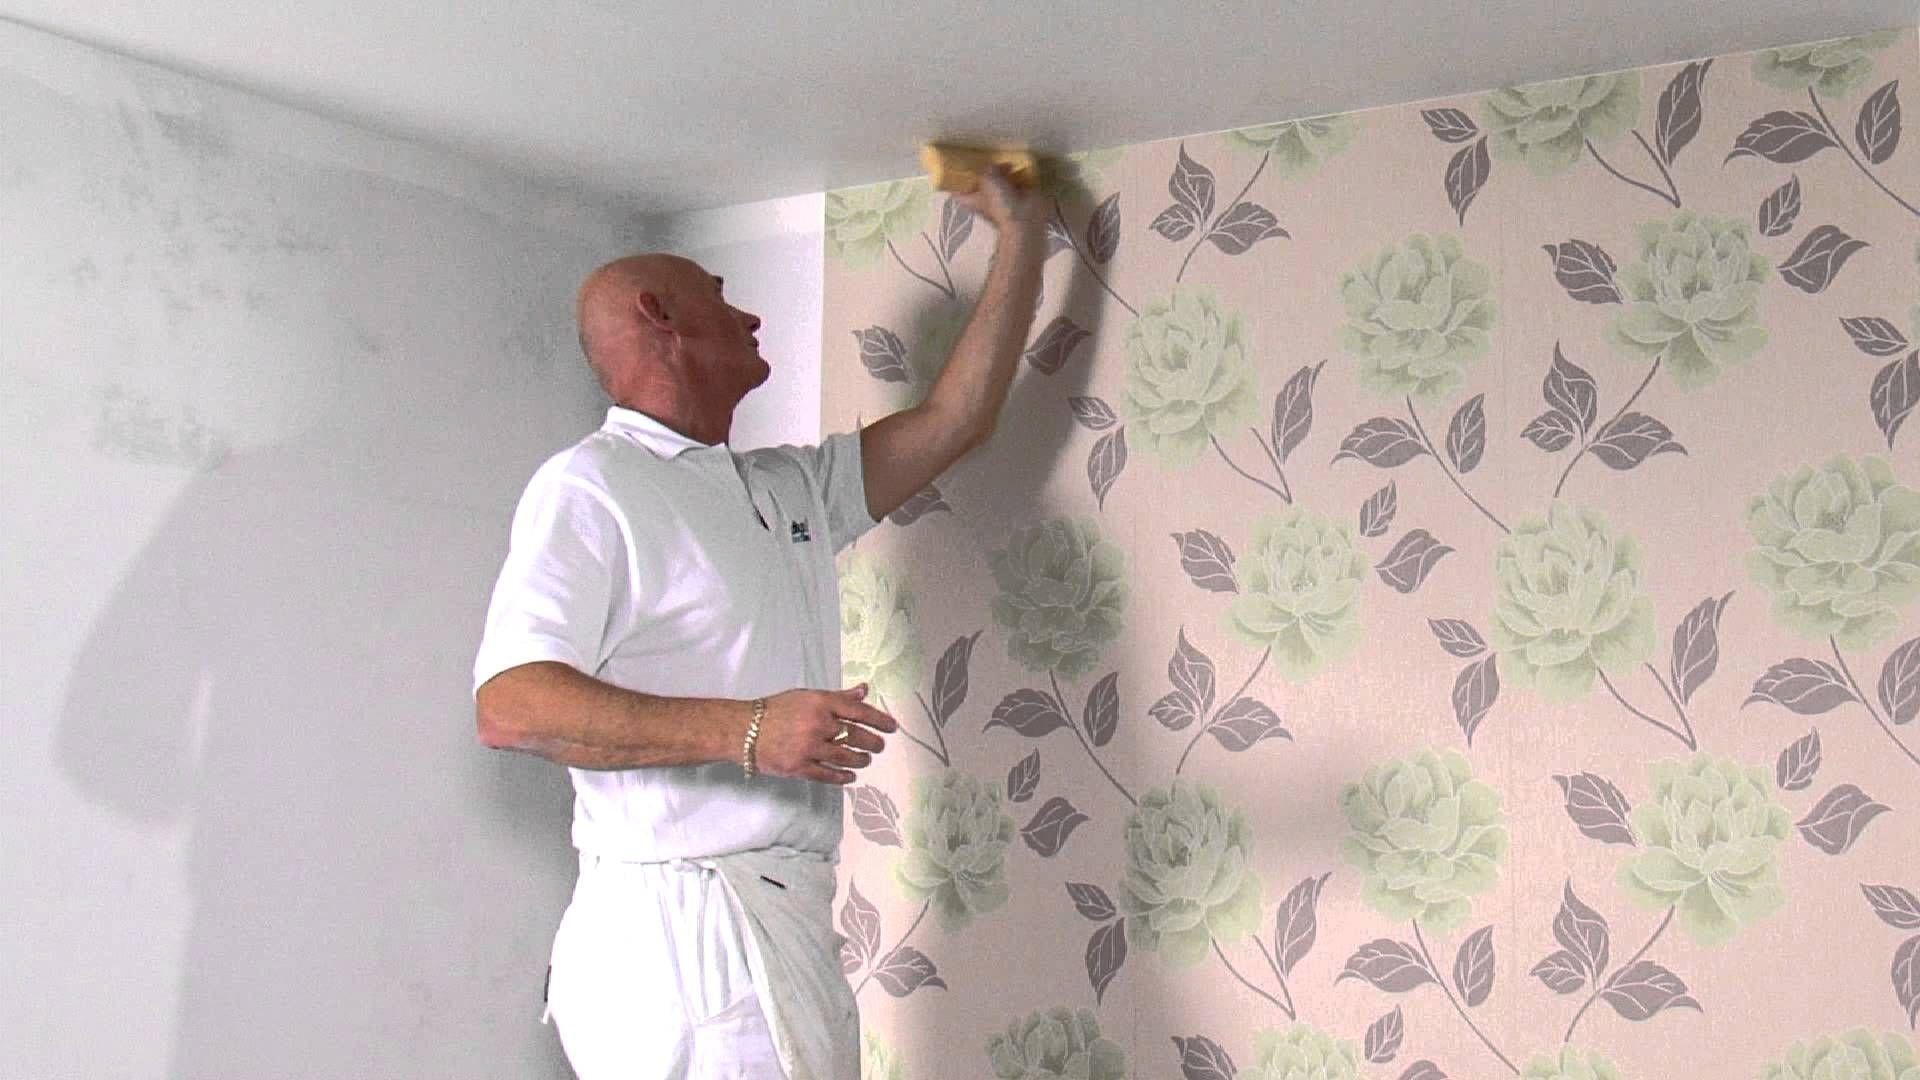 Wallpapering Practical Wallpaper Tips How To Hang